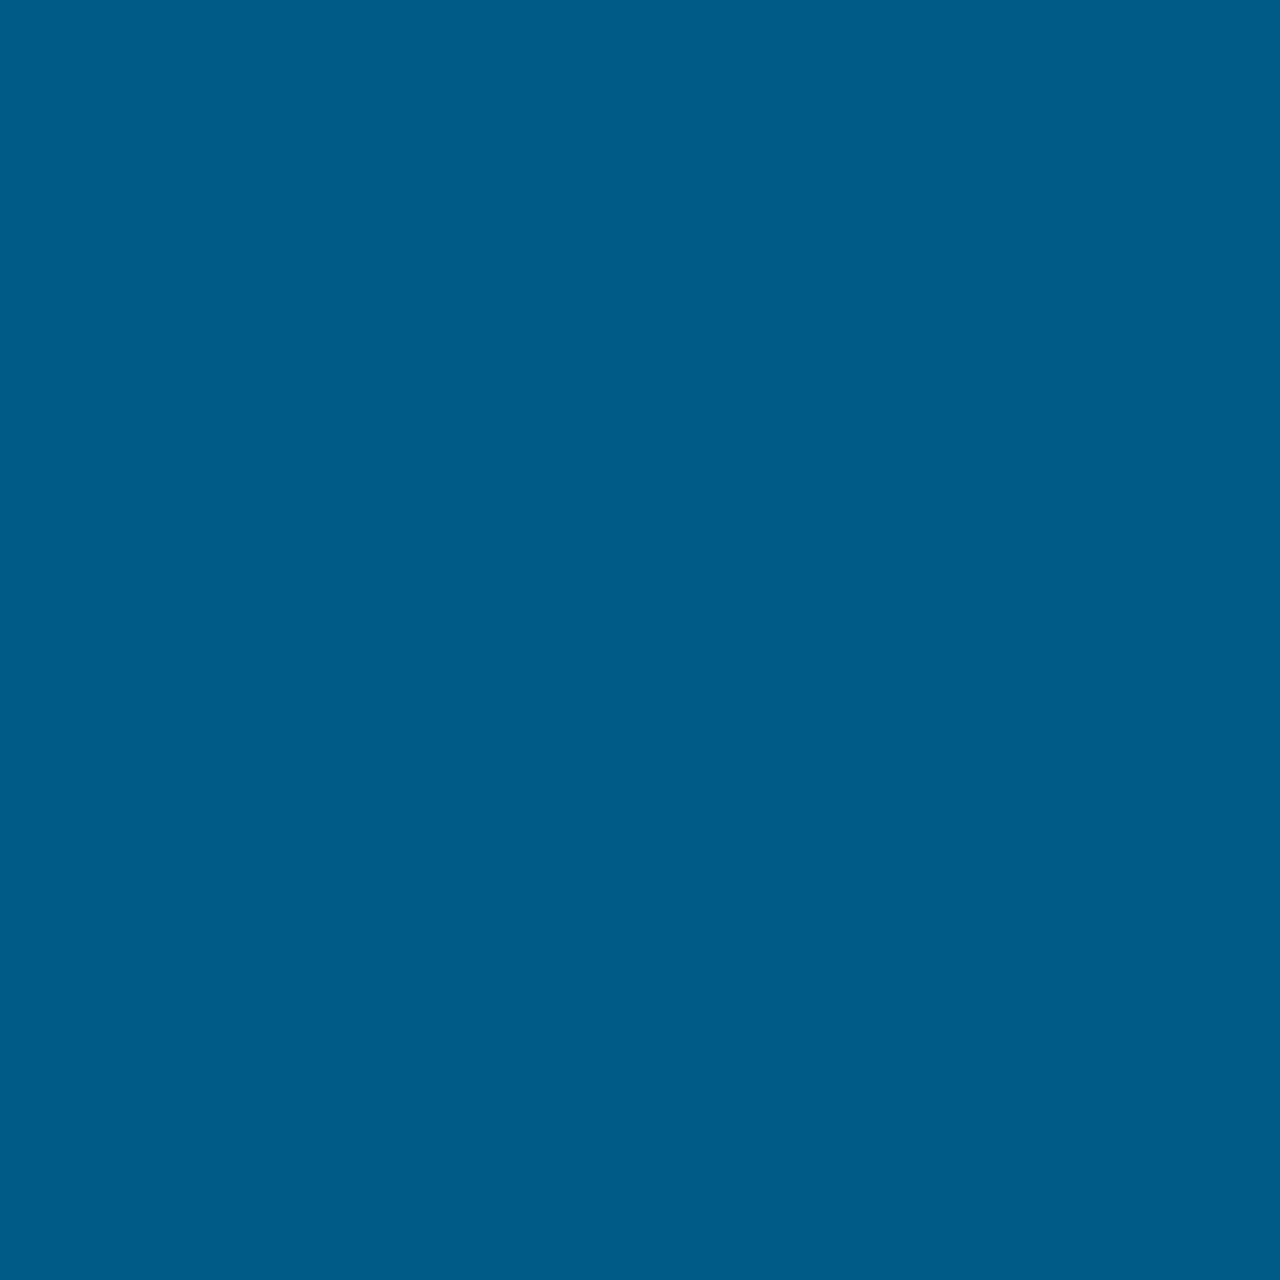 "#0077 Rosco Gels Roscolux Green Blue, 20x24"""